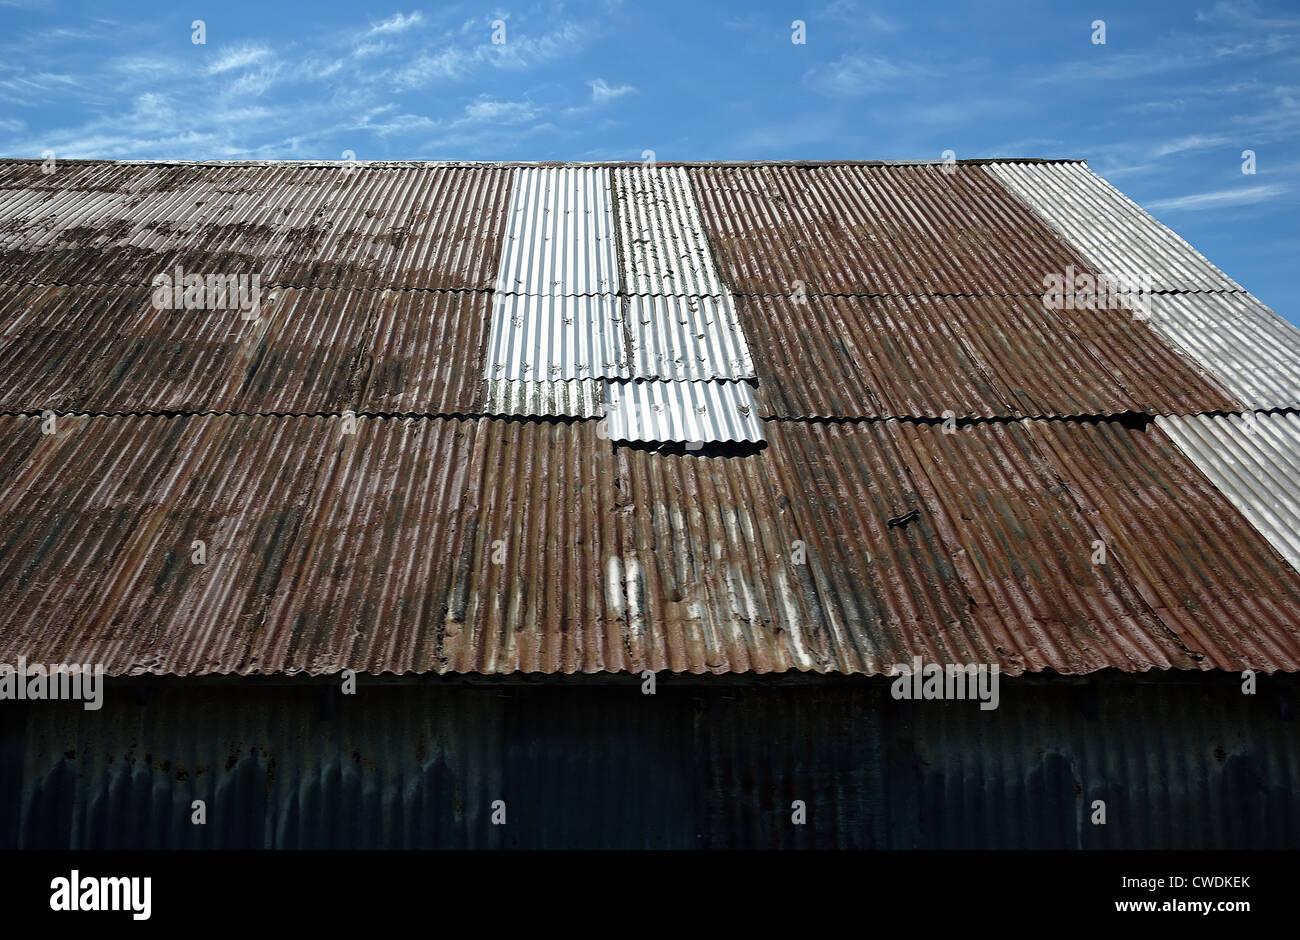 Rusty Tin Roof Stock Photo